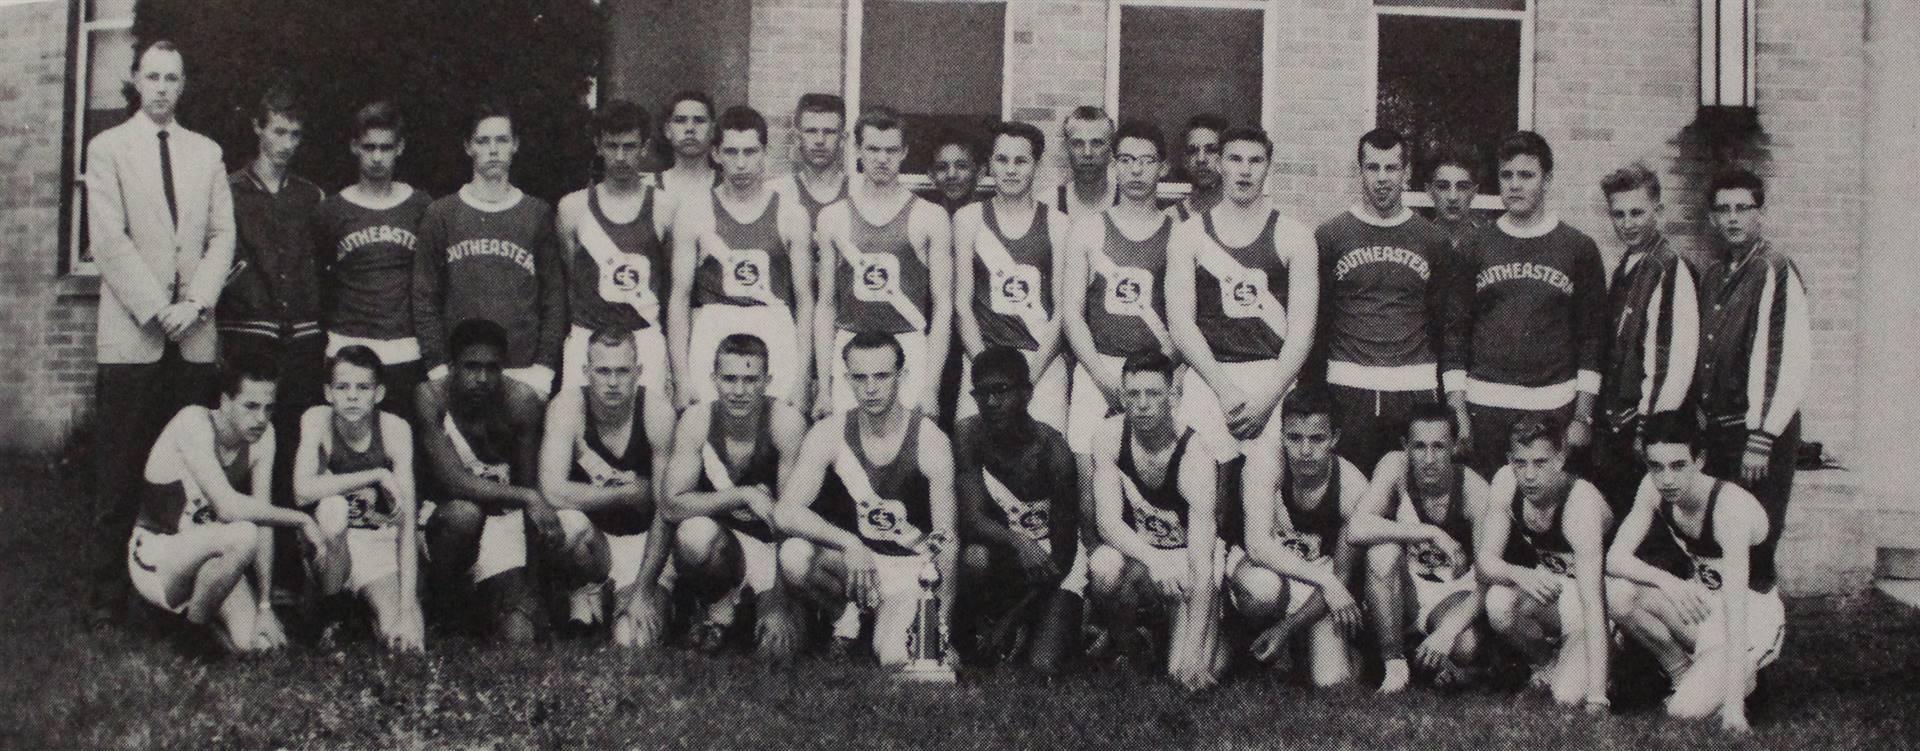 1961 Track